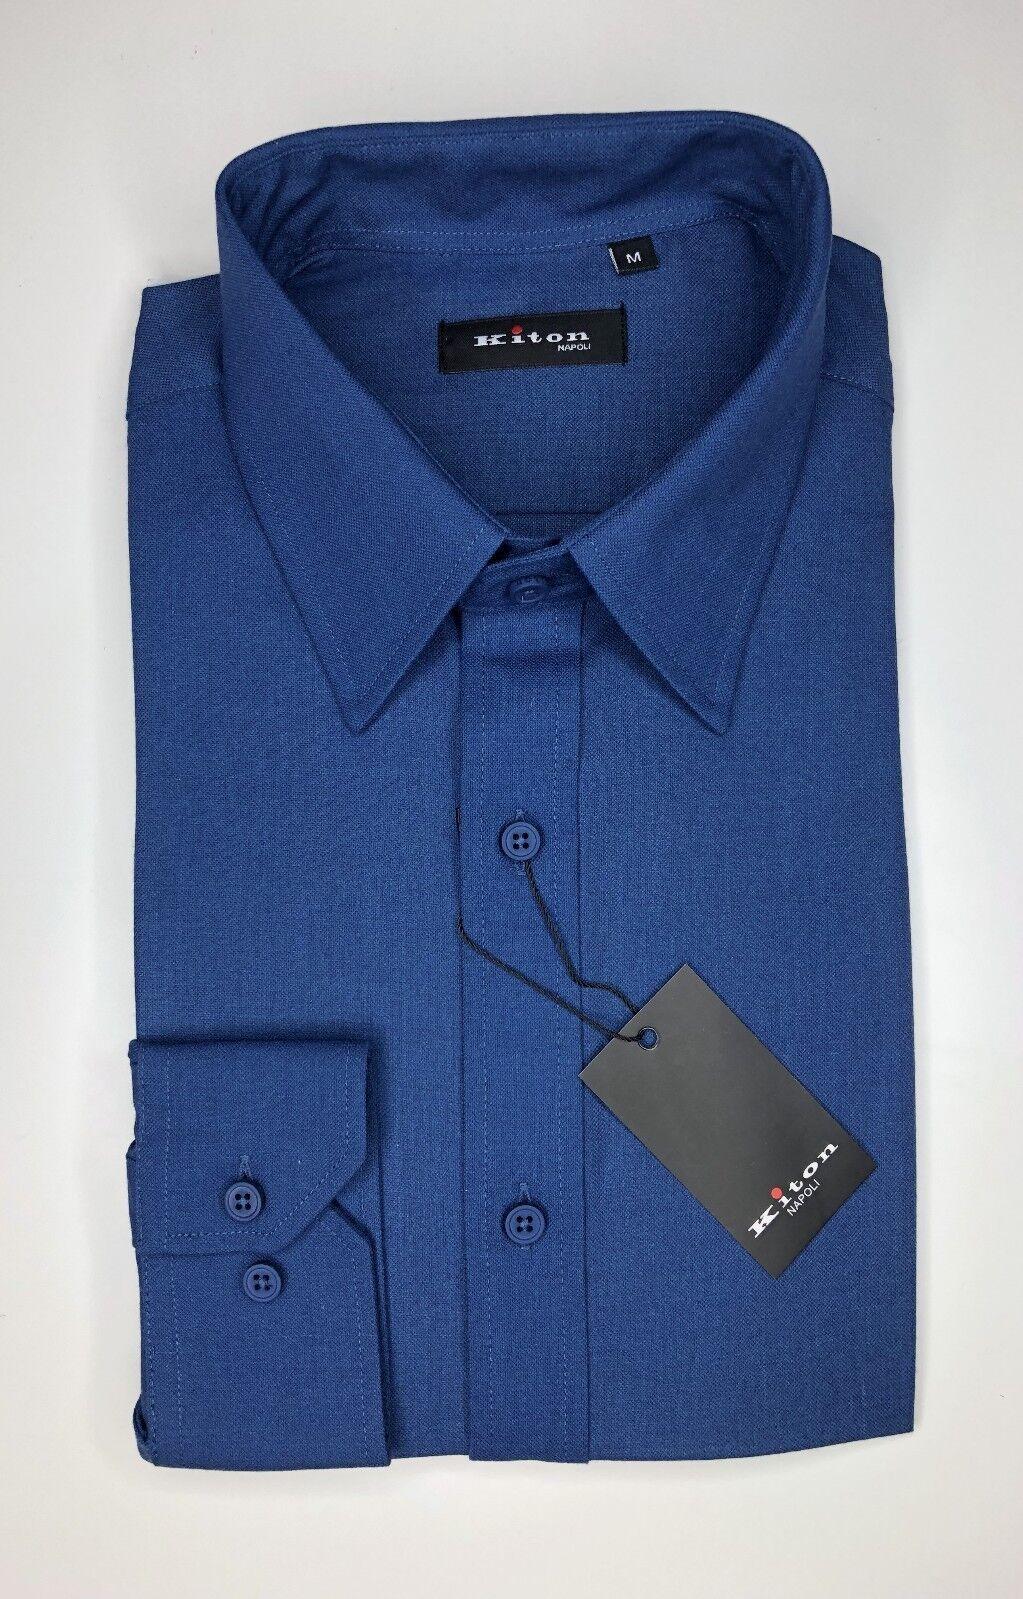 Kiton Shirt bluee Dress Shirt True Beauty Royal bluee Single Stitch Sz 15.5 32 33